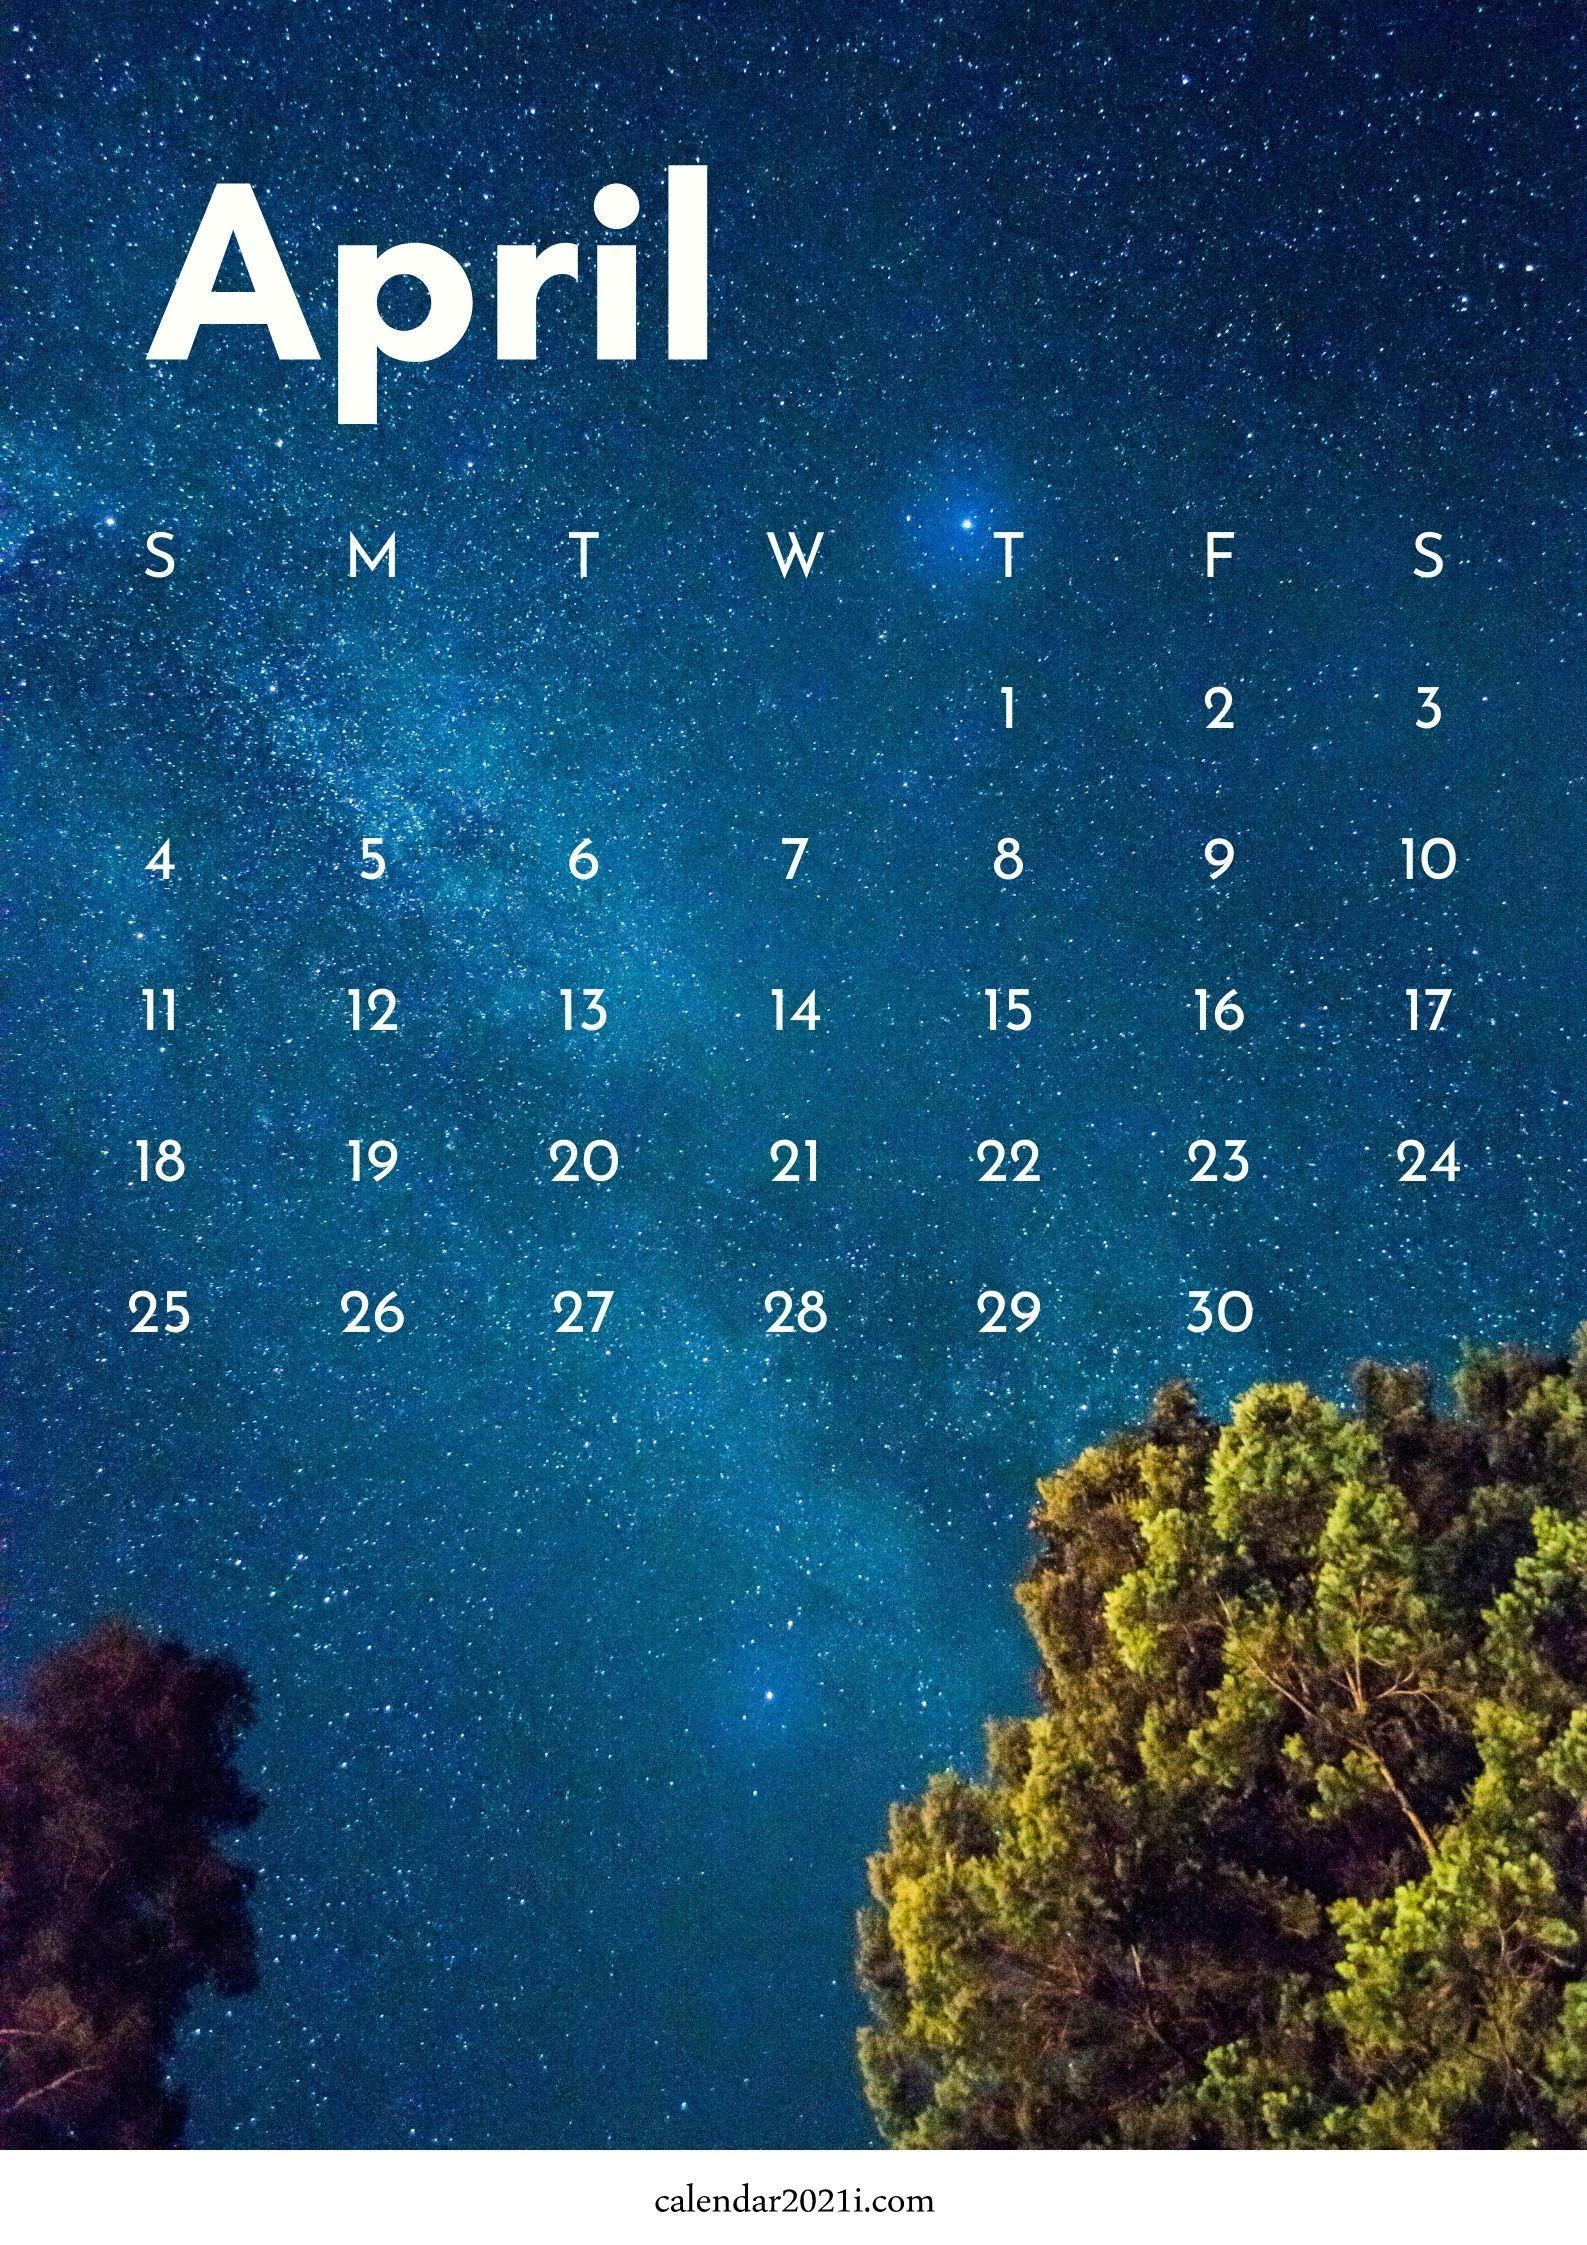 iPhone April 2021 Calendar Wallpapers Download Calendar 2021 1587x2245